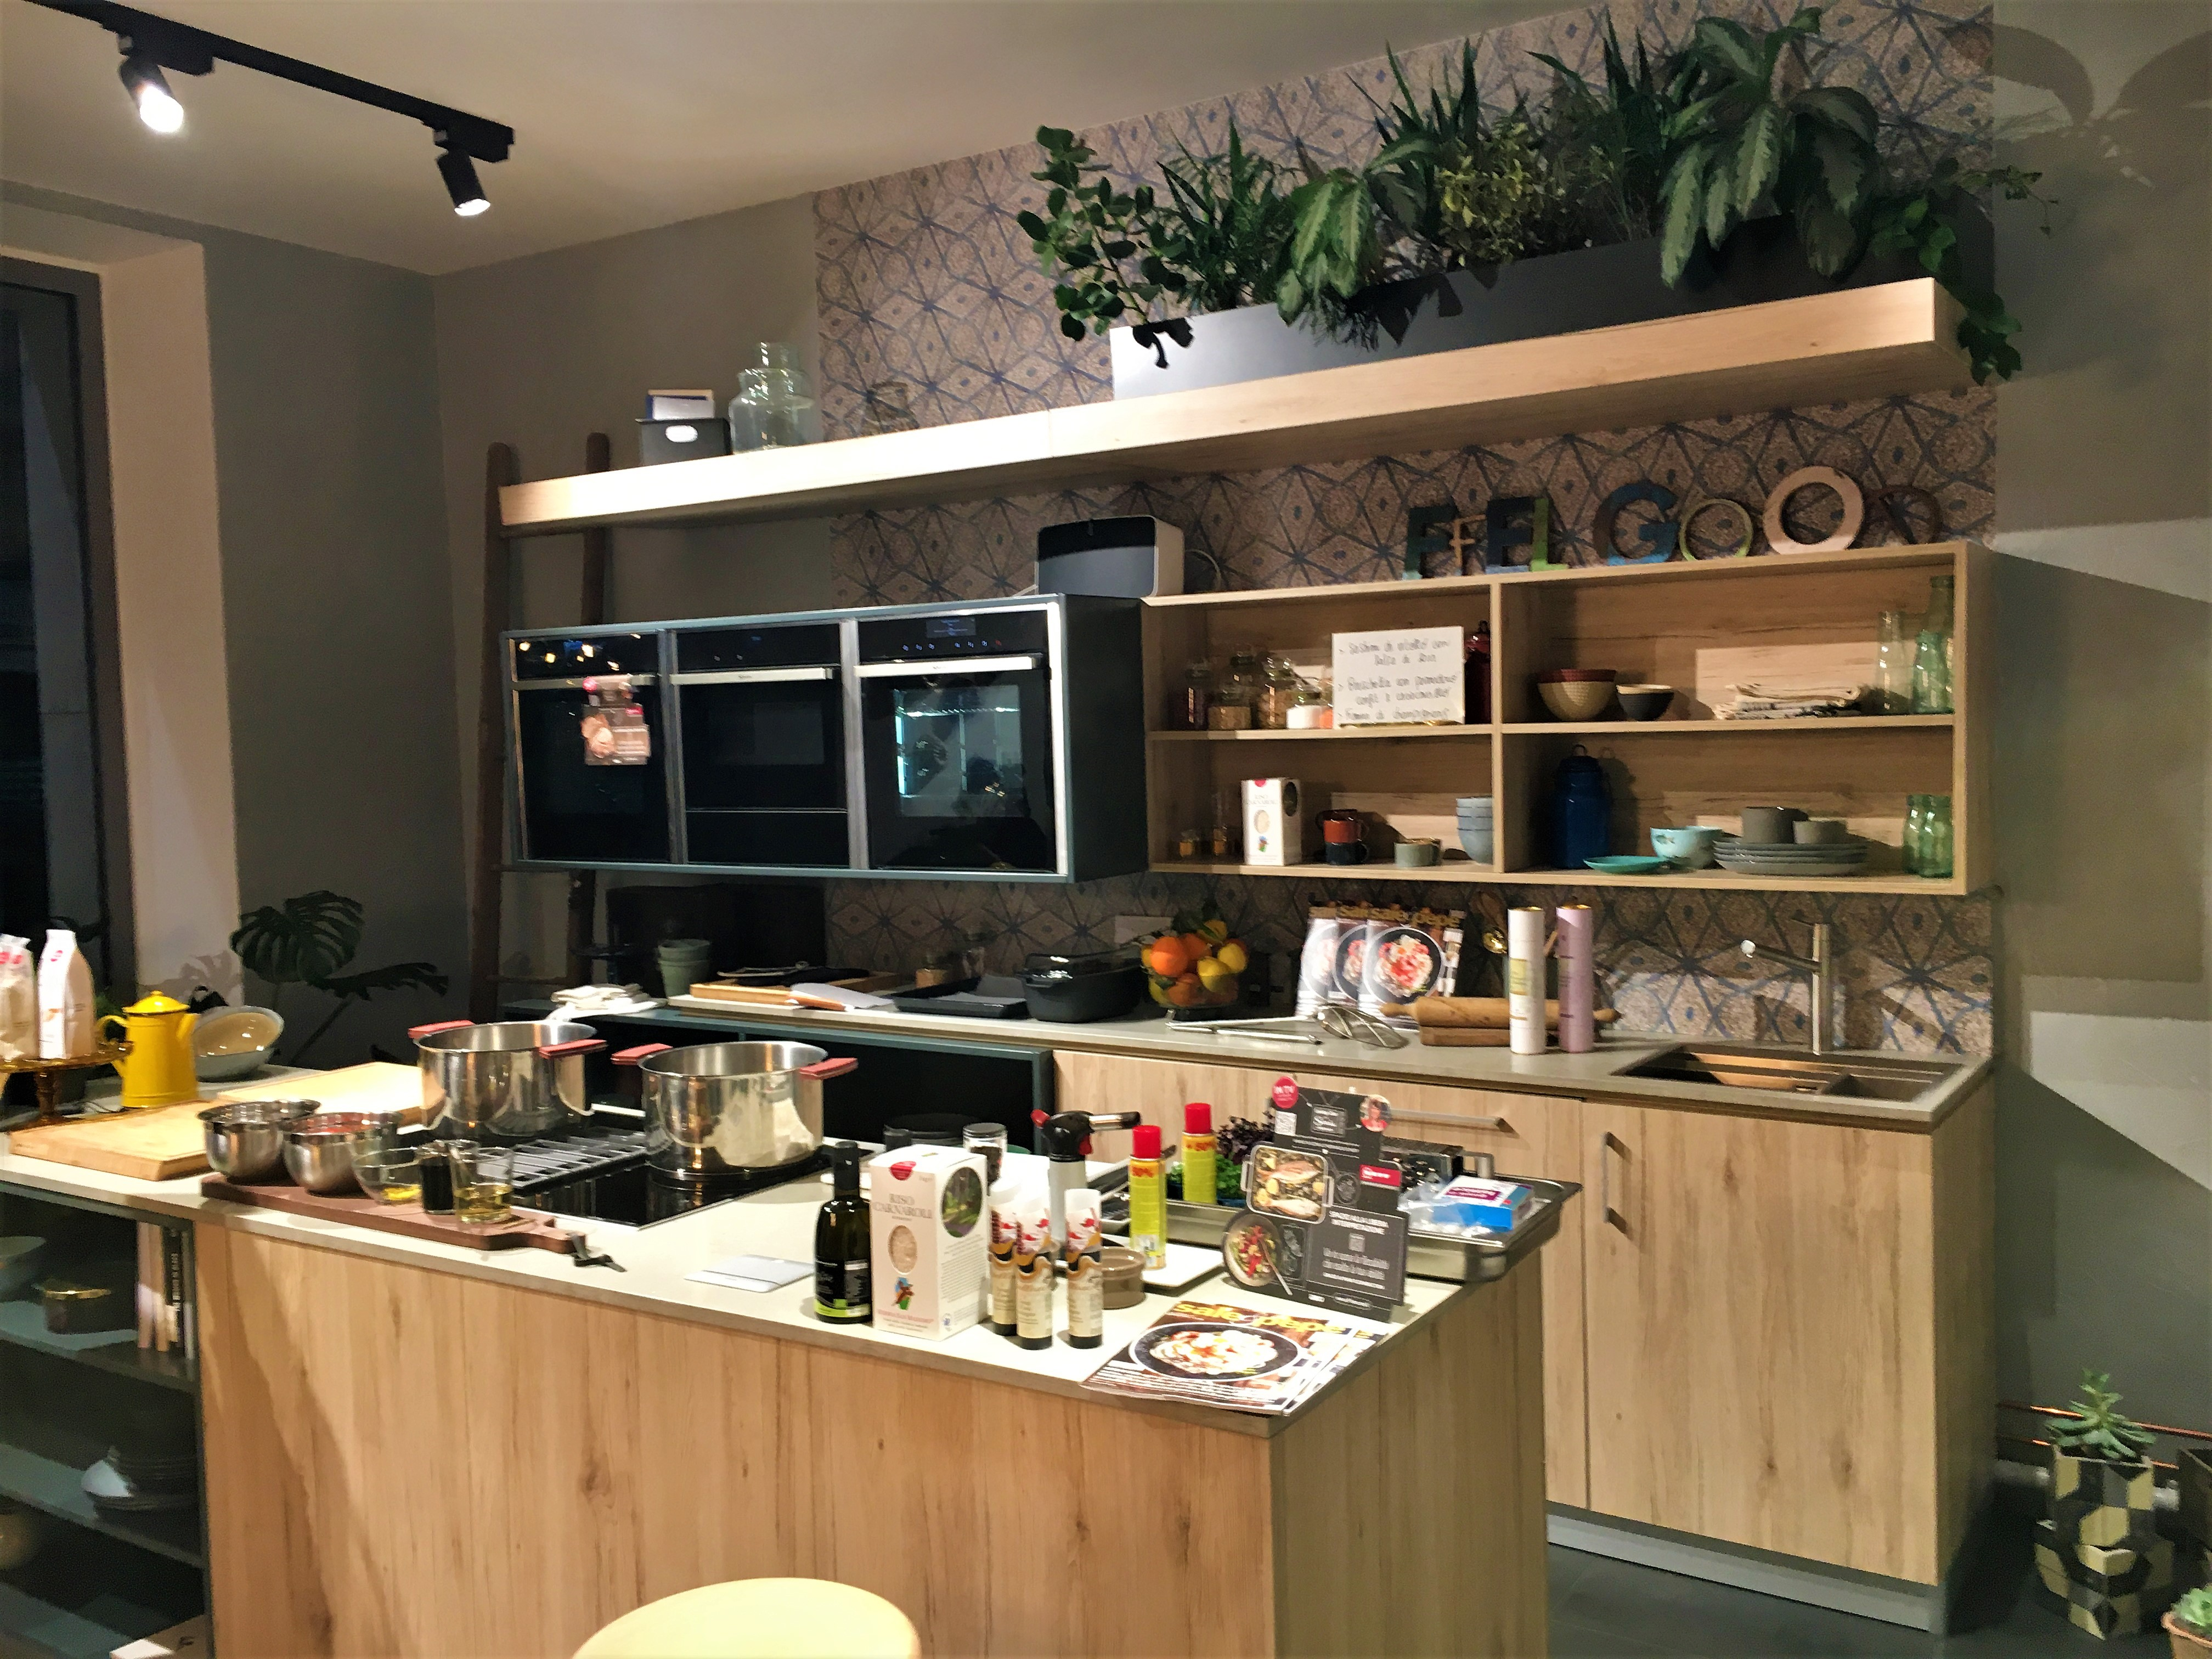 Nuova Sede Per La Scuola Di Cucina Di Sale Pepe Cucina Svago